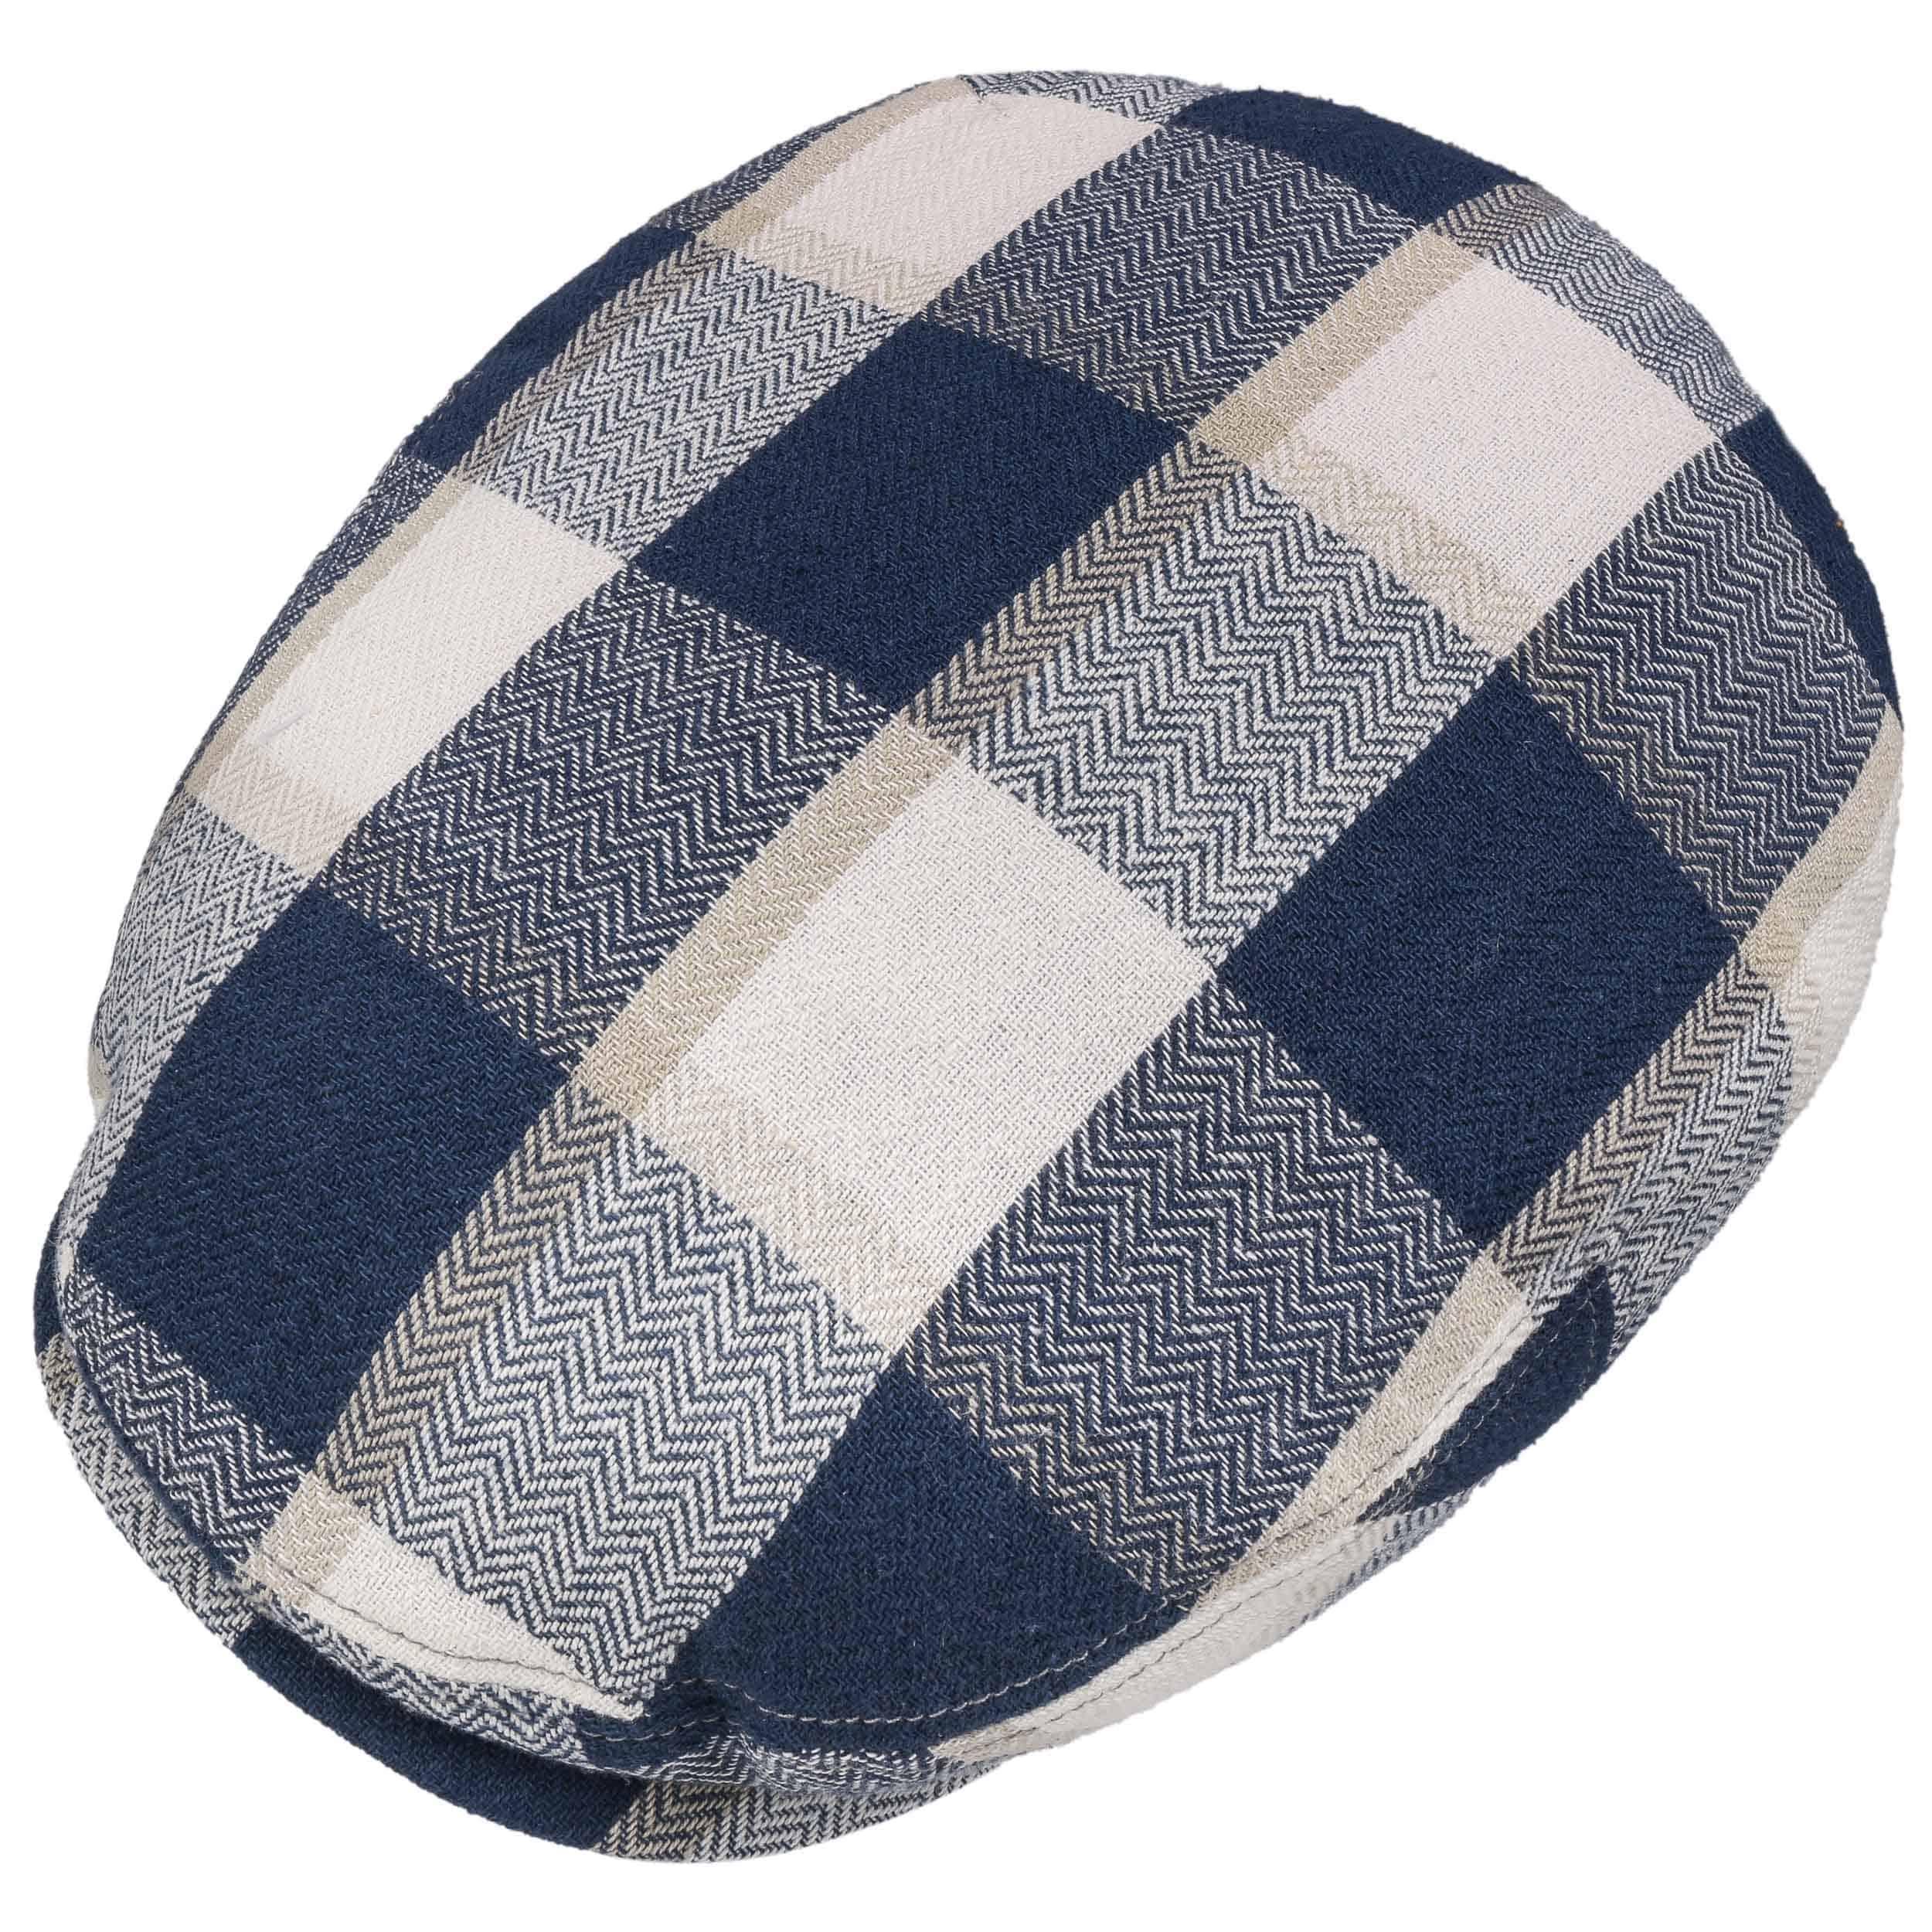 2907a4c9 Kent Check Linen Cap by Stetson - blue-beige 1 ...